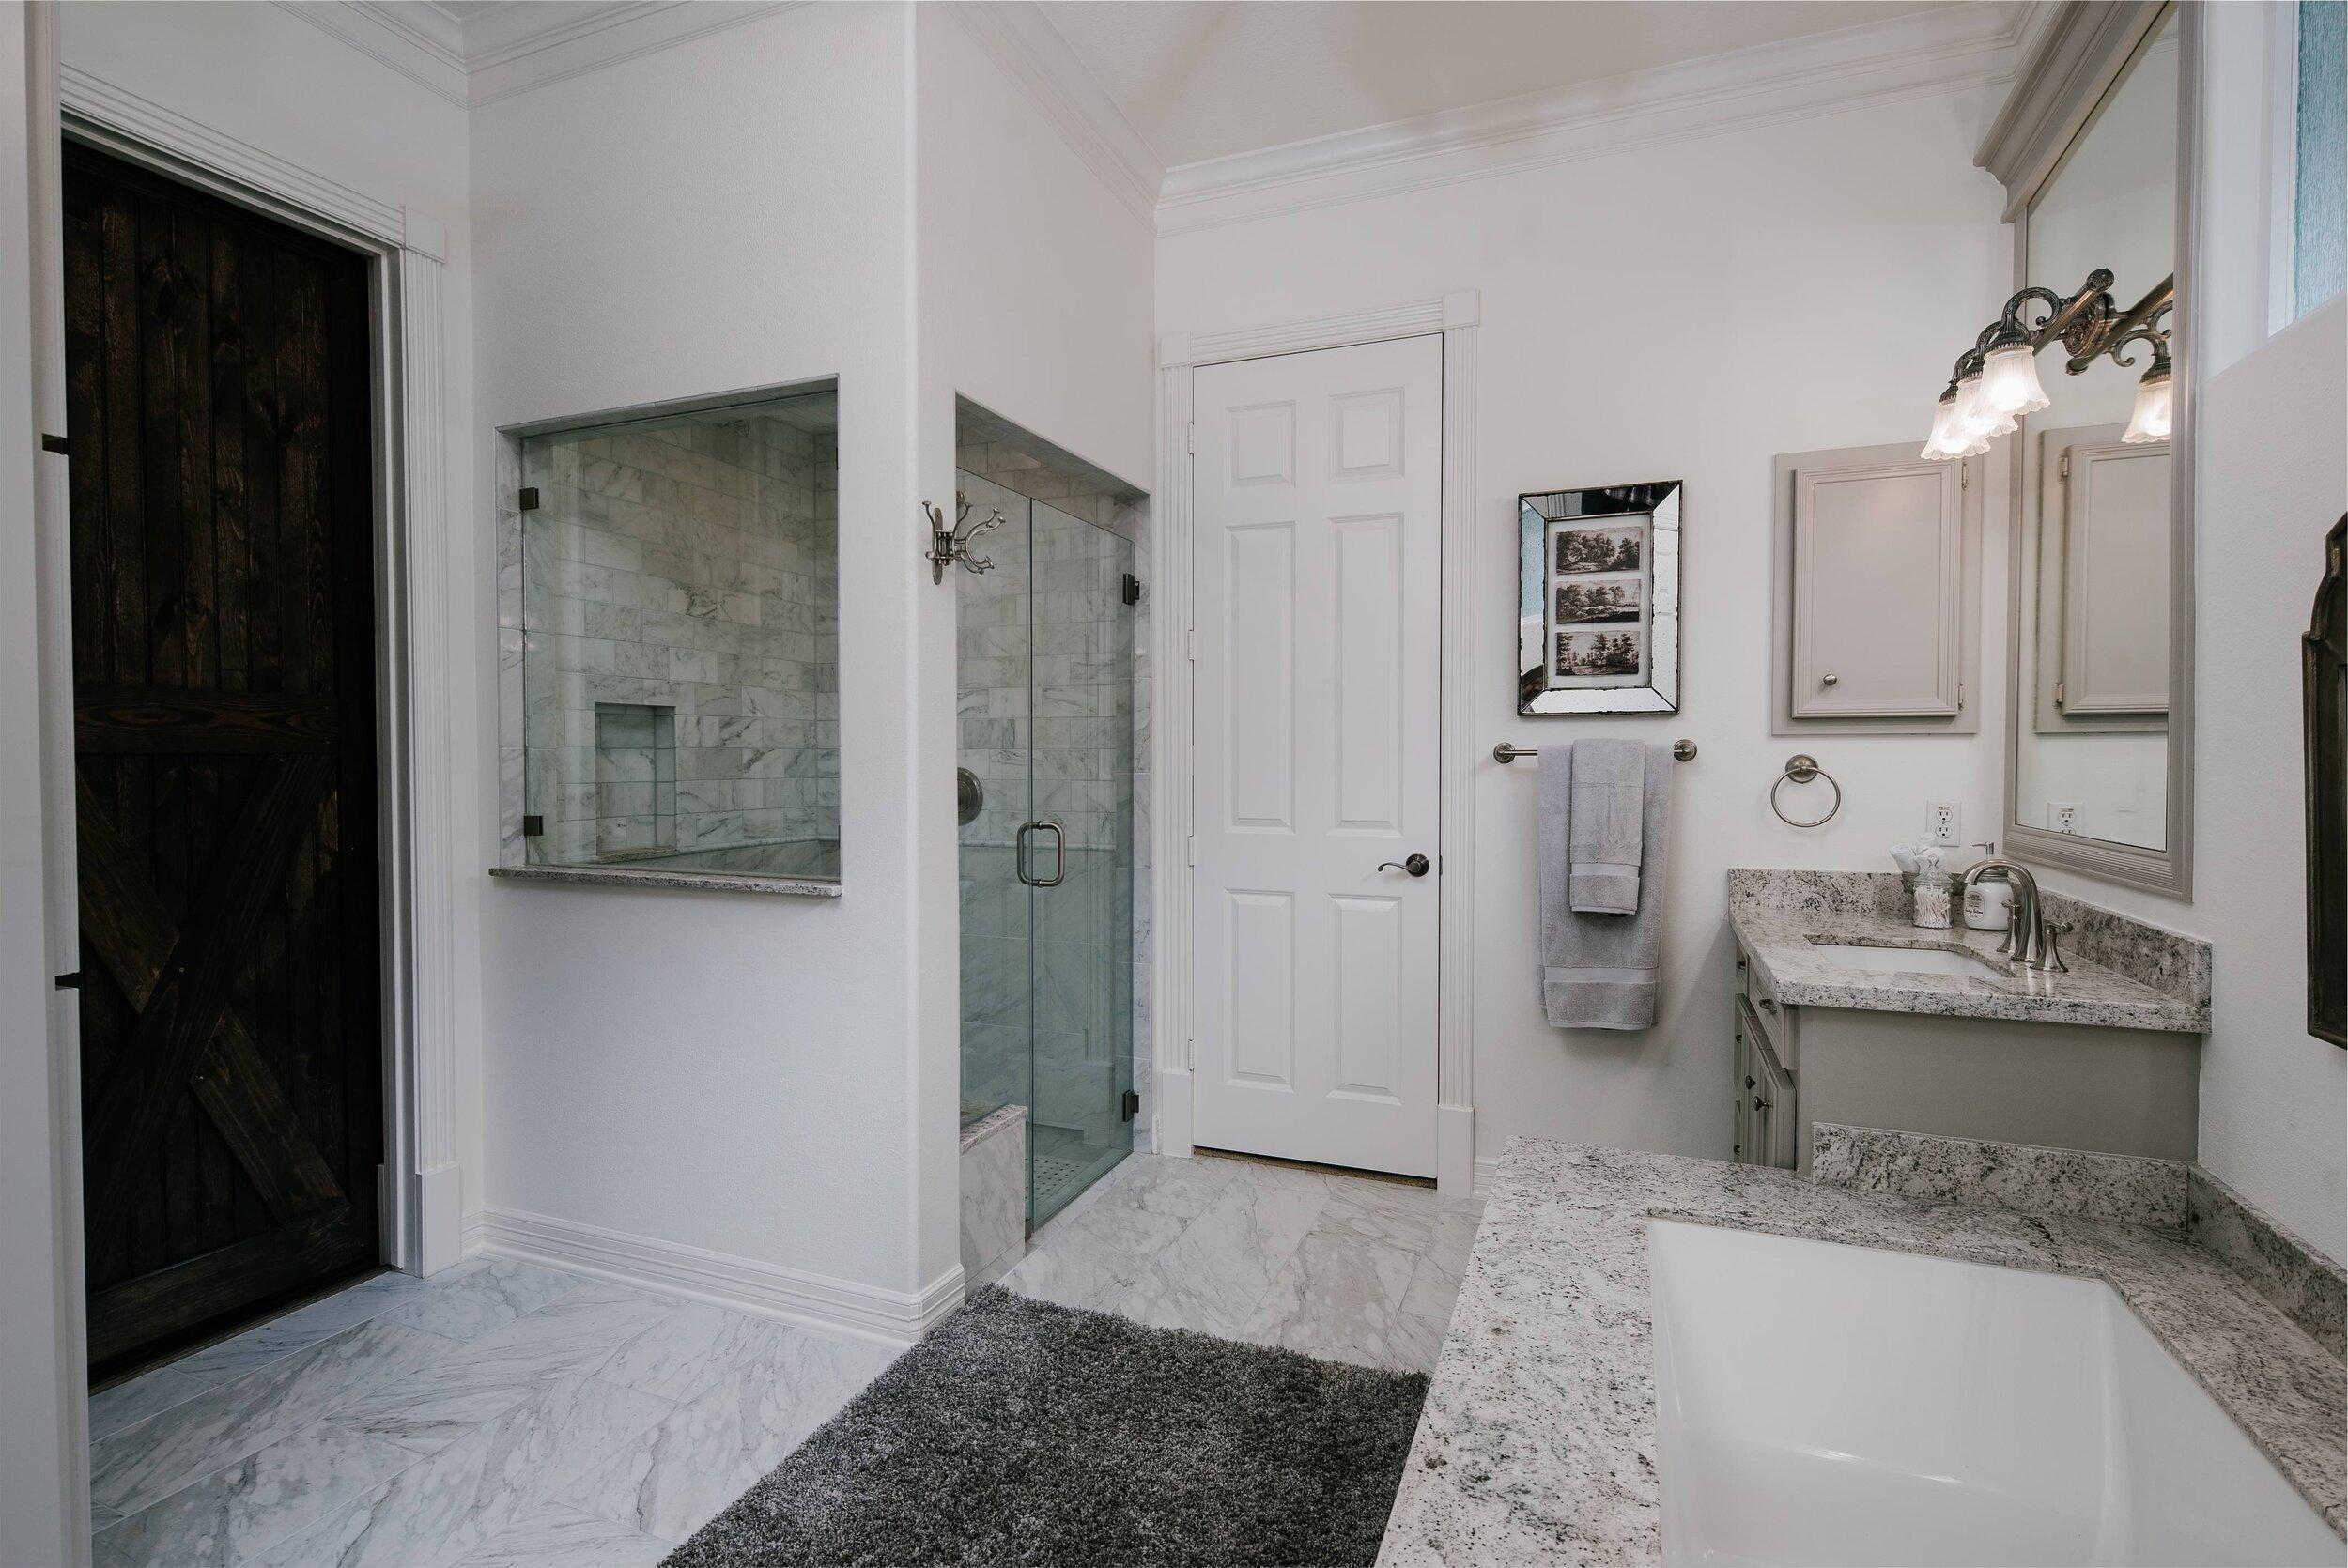 Elegant bathroom remodel, bathroom renovation, master bathroom inspiration, grey bathroom, undermount sink, undermount bathtub, granite countertops, carrara marble floors, white bathtub, white and grey bathroom.